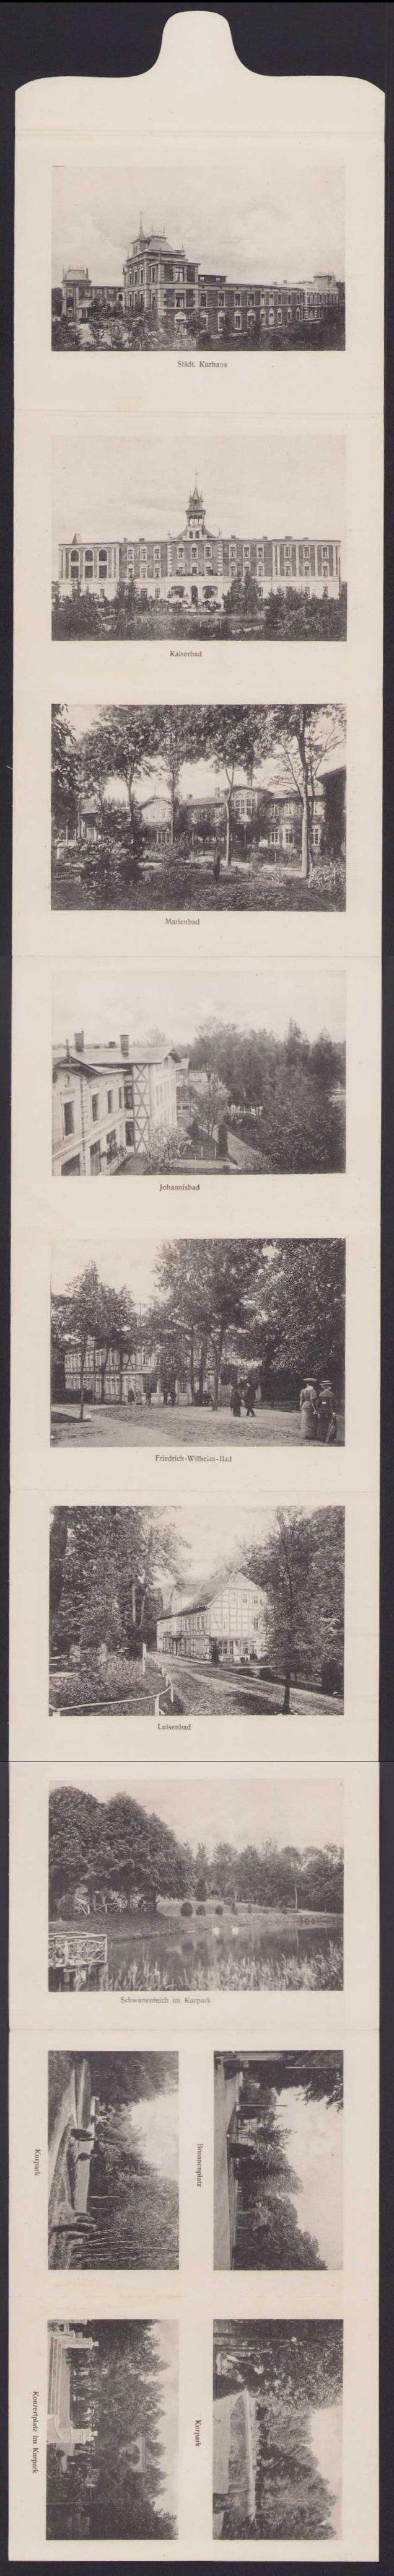 Leporello-Ansichtskarte Bad Polzin, Städtisches Kurhaus, Johannisbad, Marienbad,